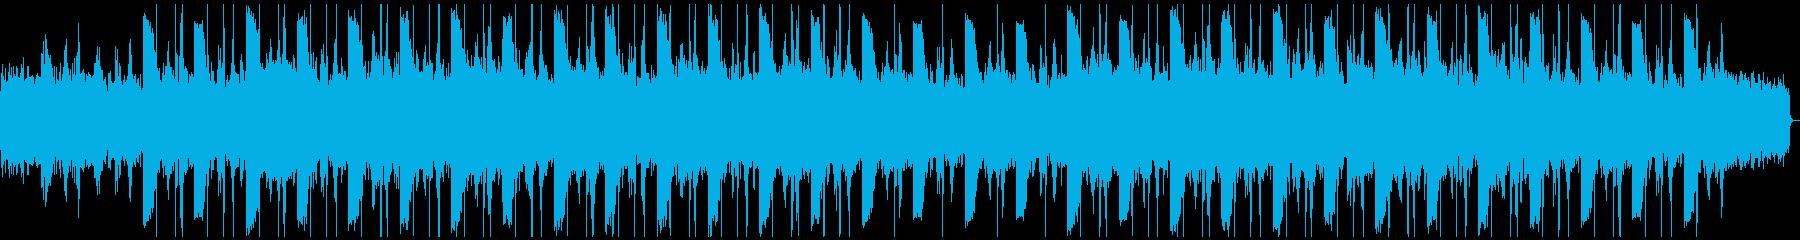 Lo-Fiビート_チル_リラックスの再生済みの波形